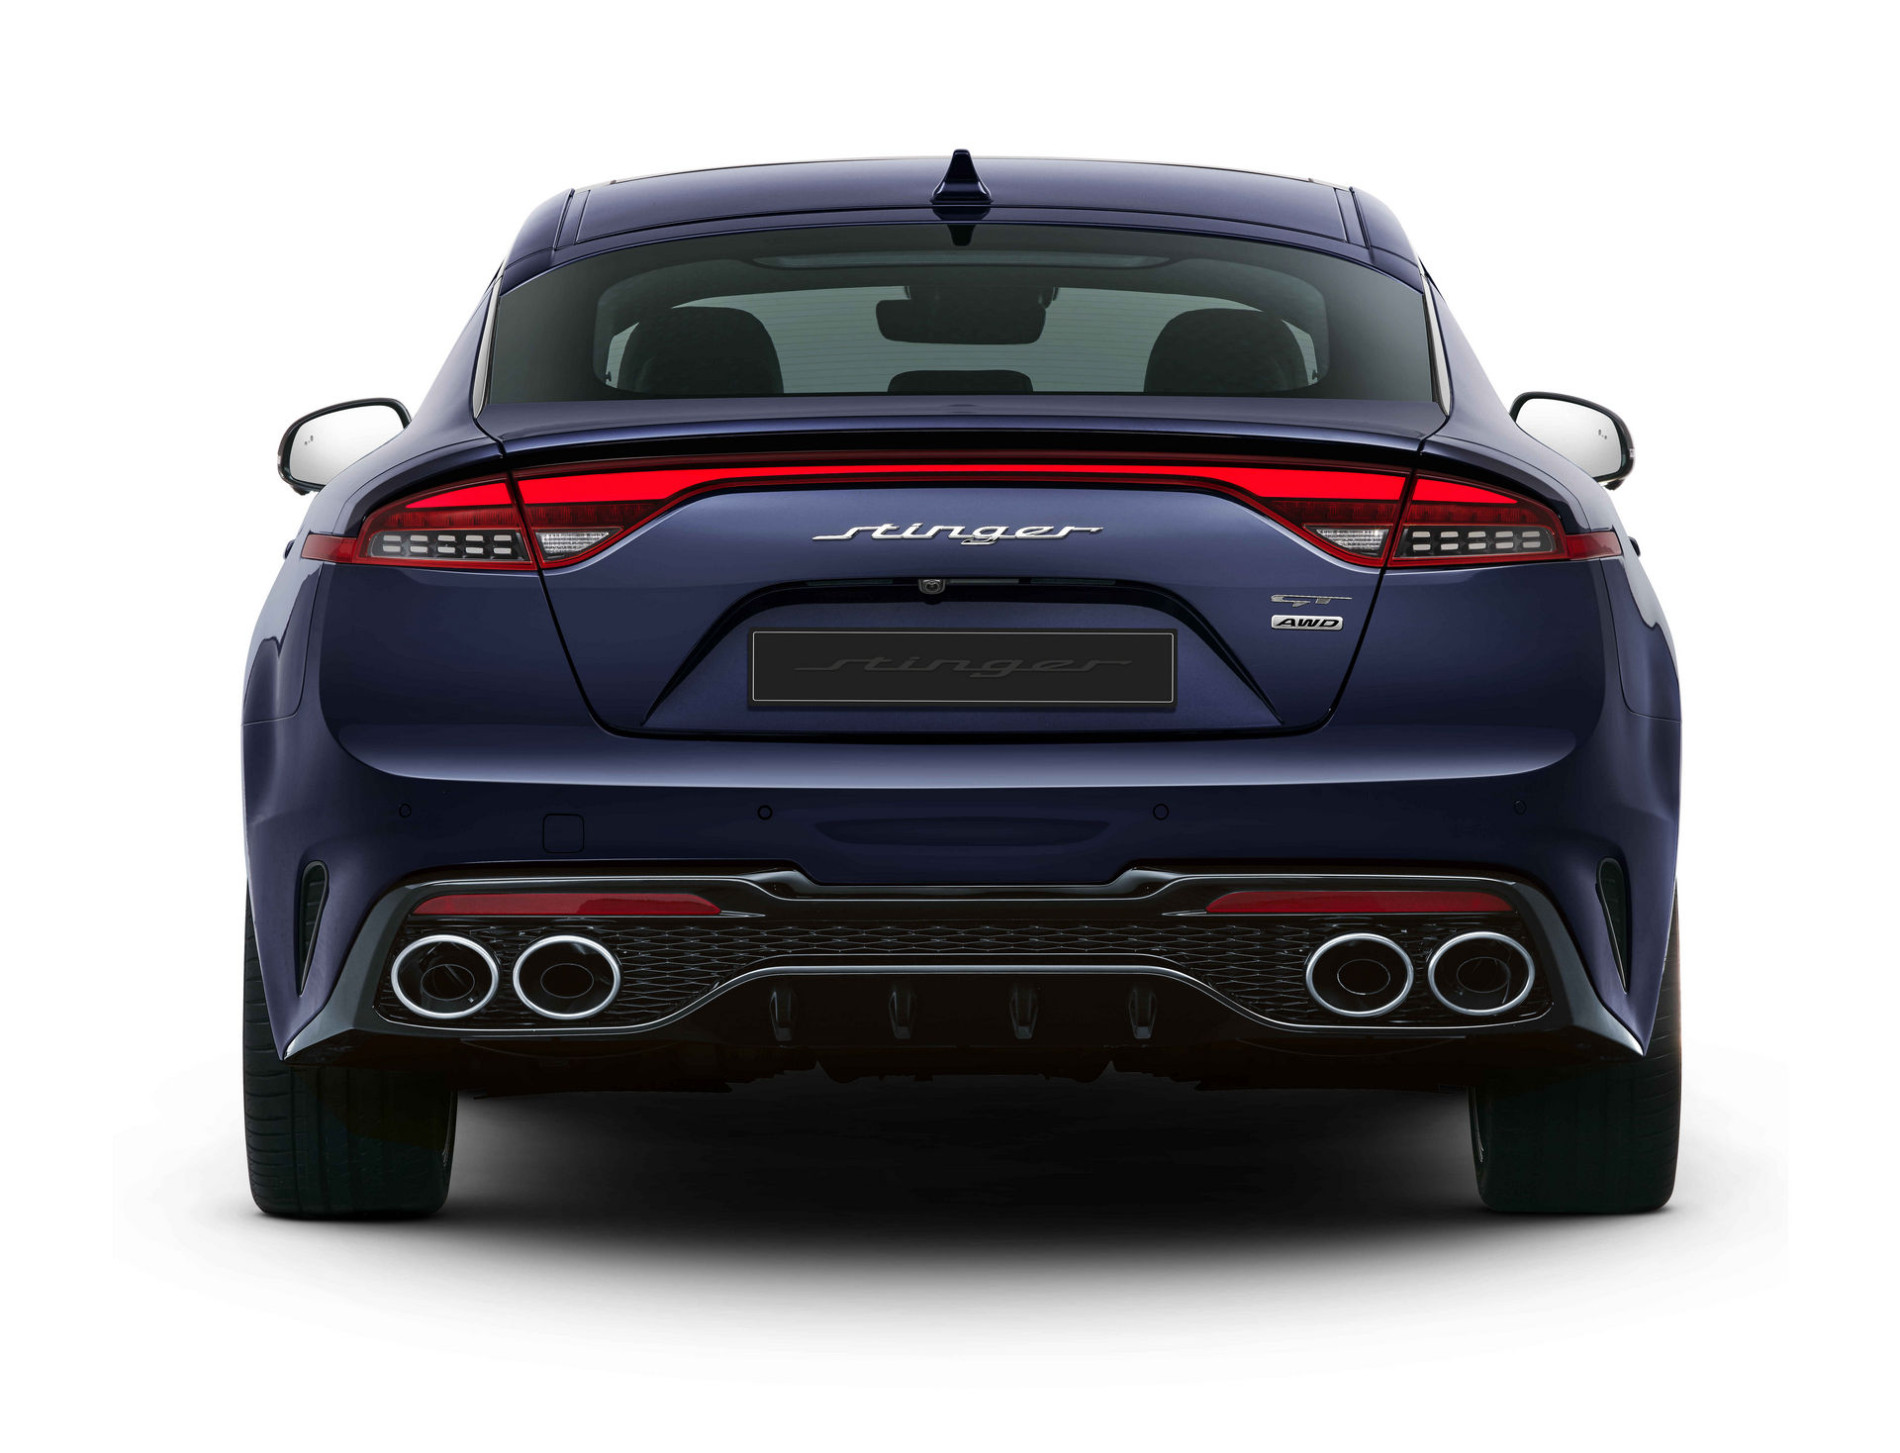 Kia Stinger Facelift - Kia Stinger Facelift